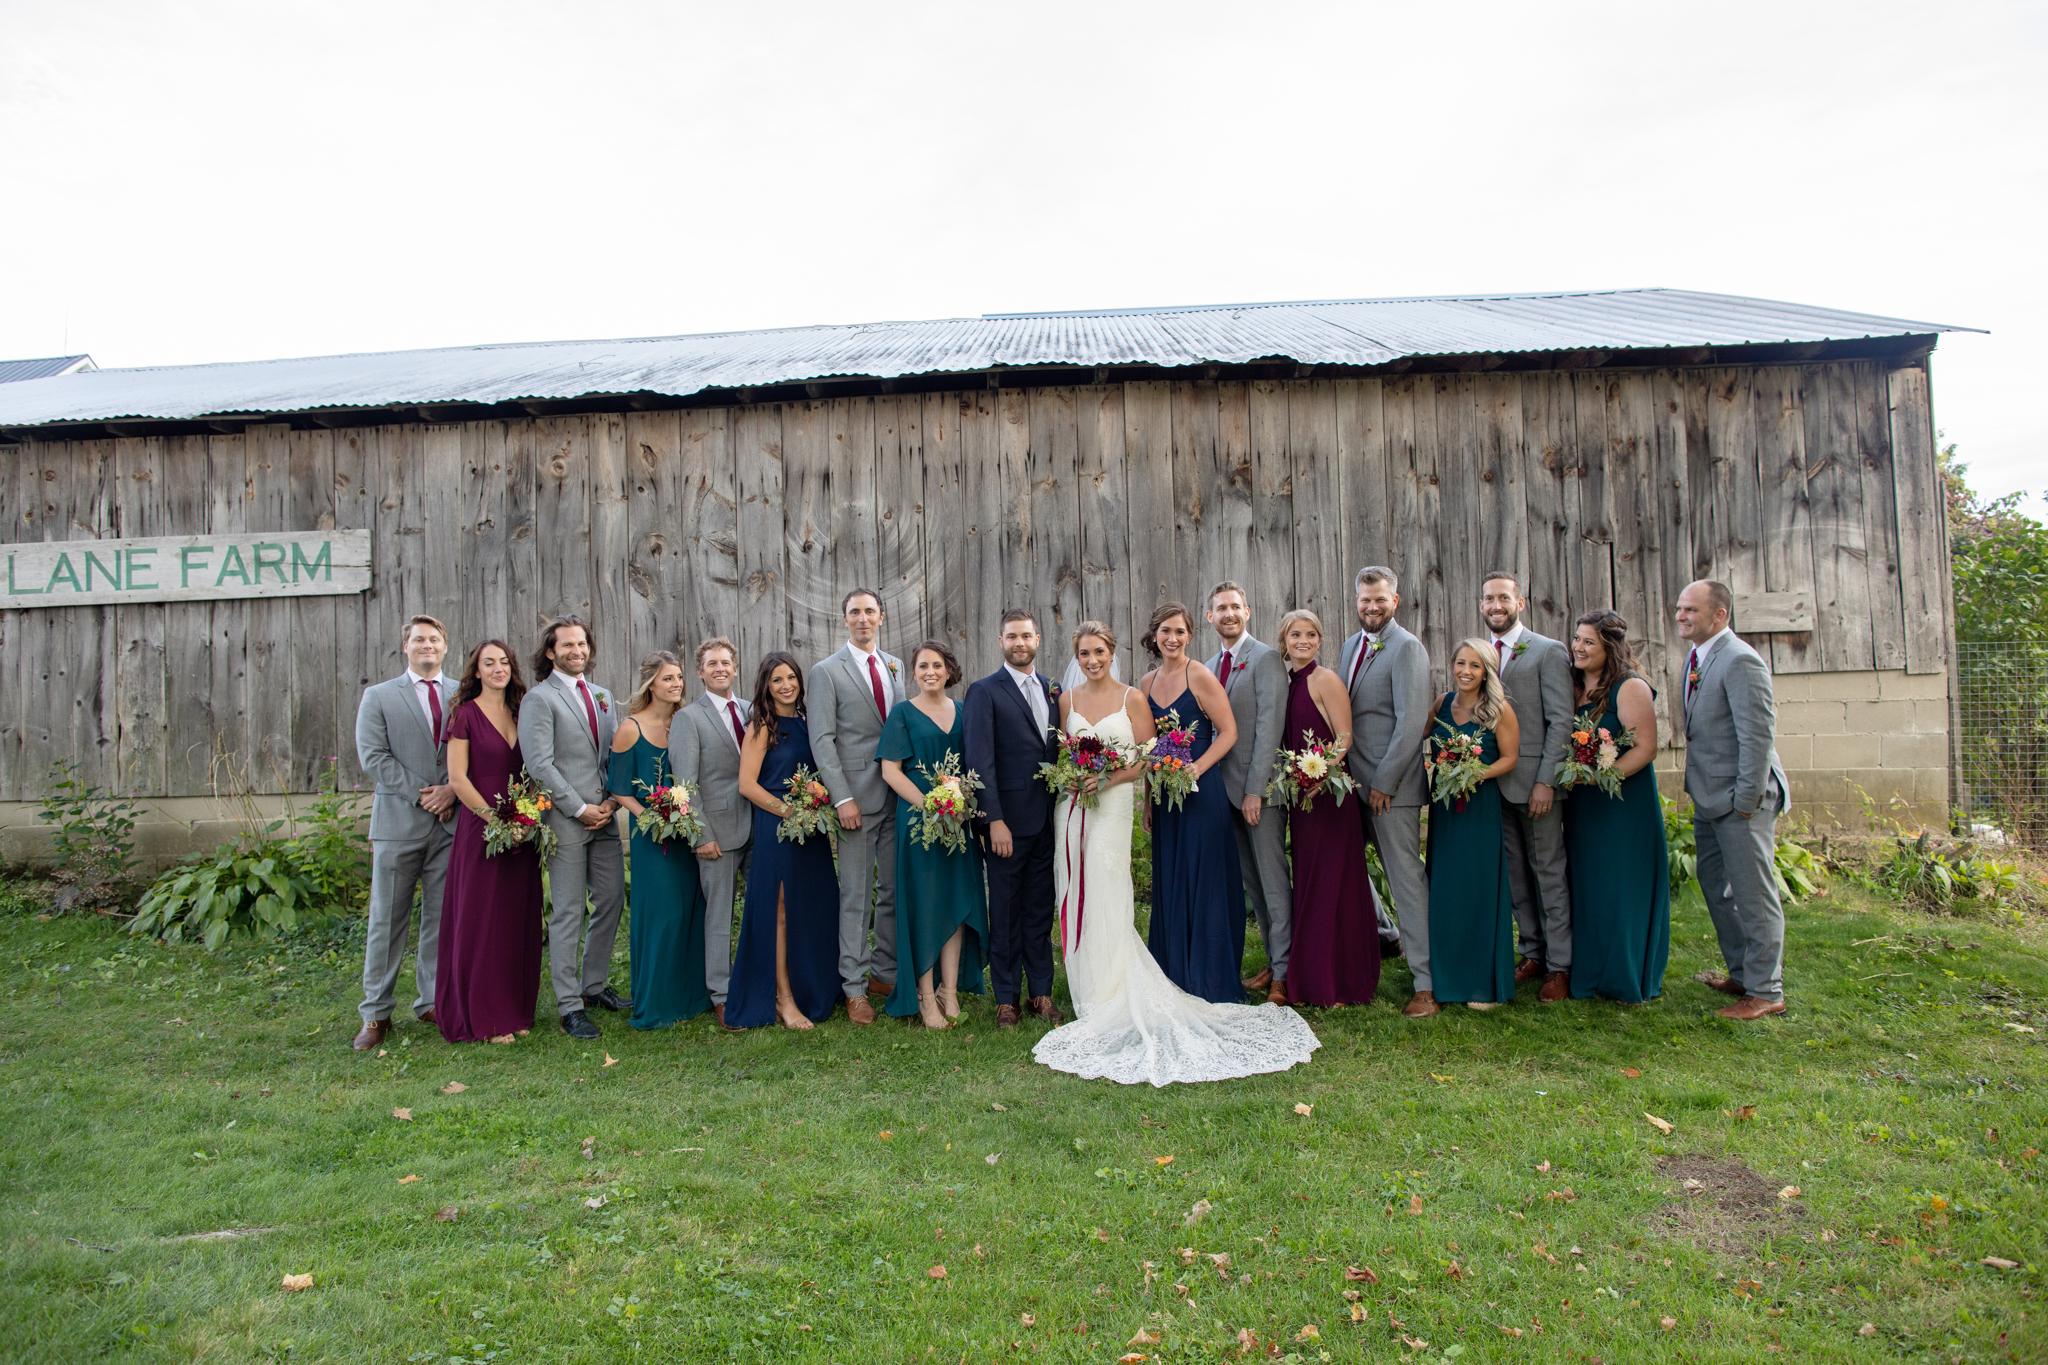 maine-farm-wedding-photographer-stepheneycollins-157.jpg